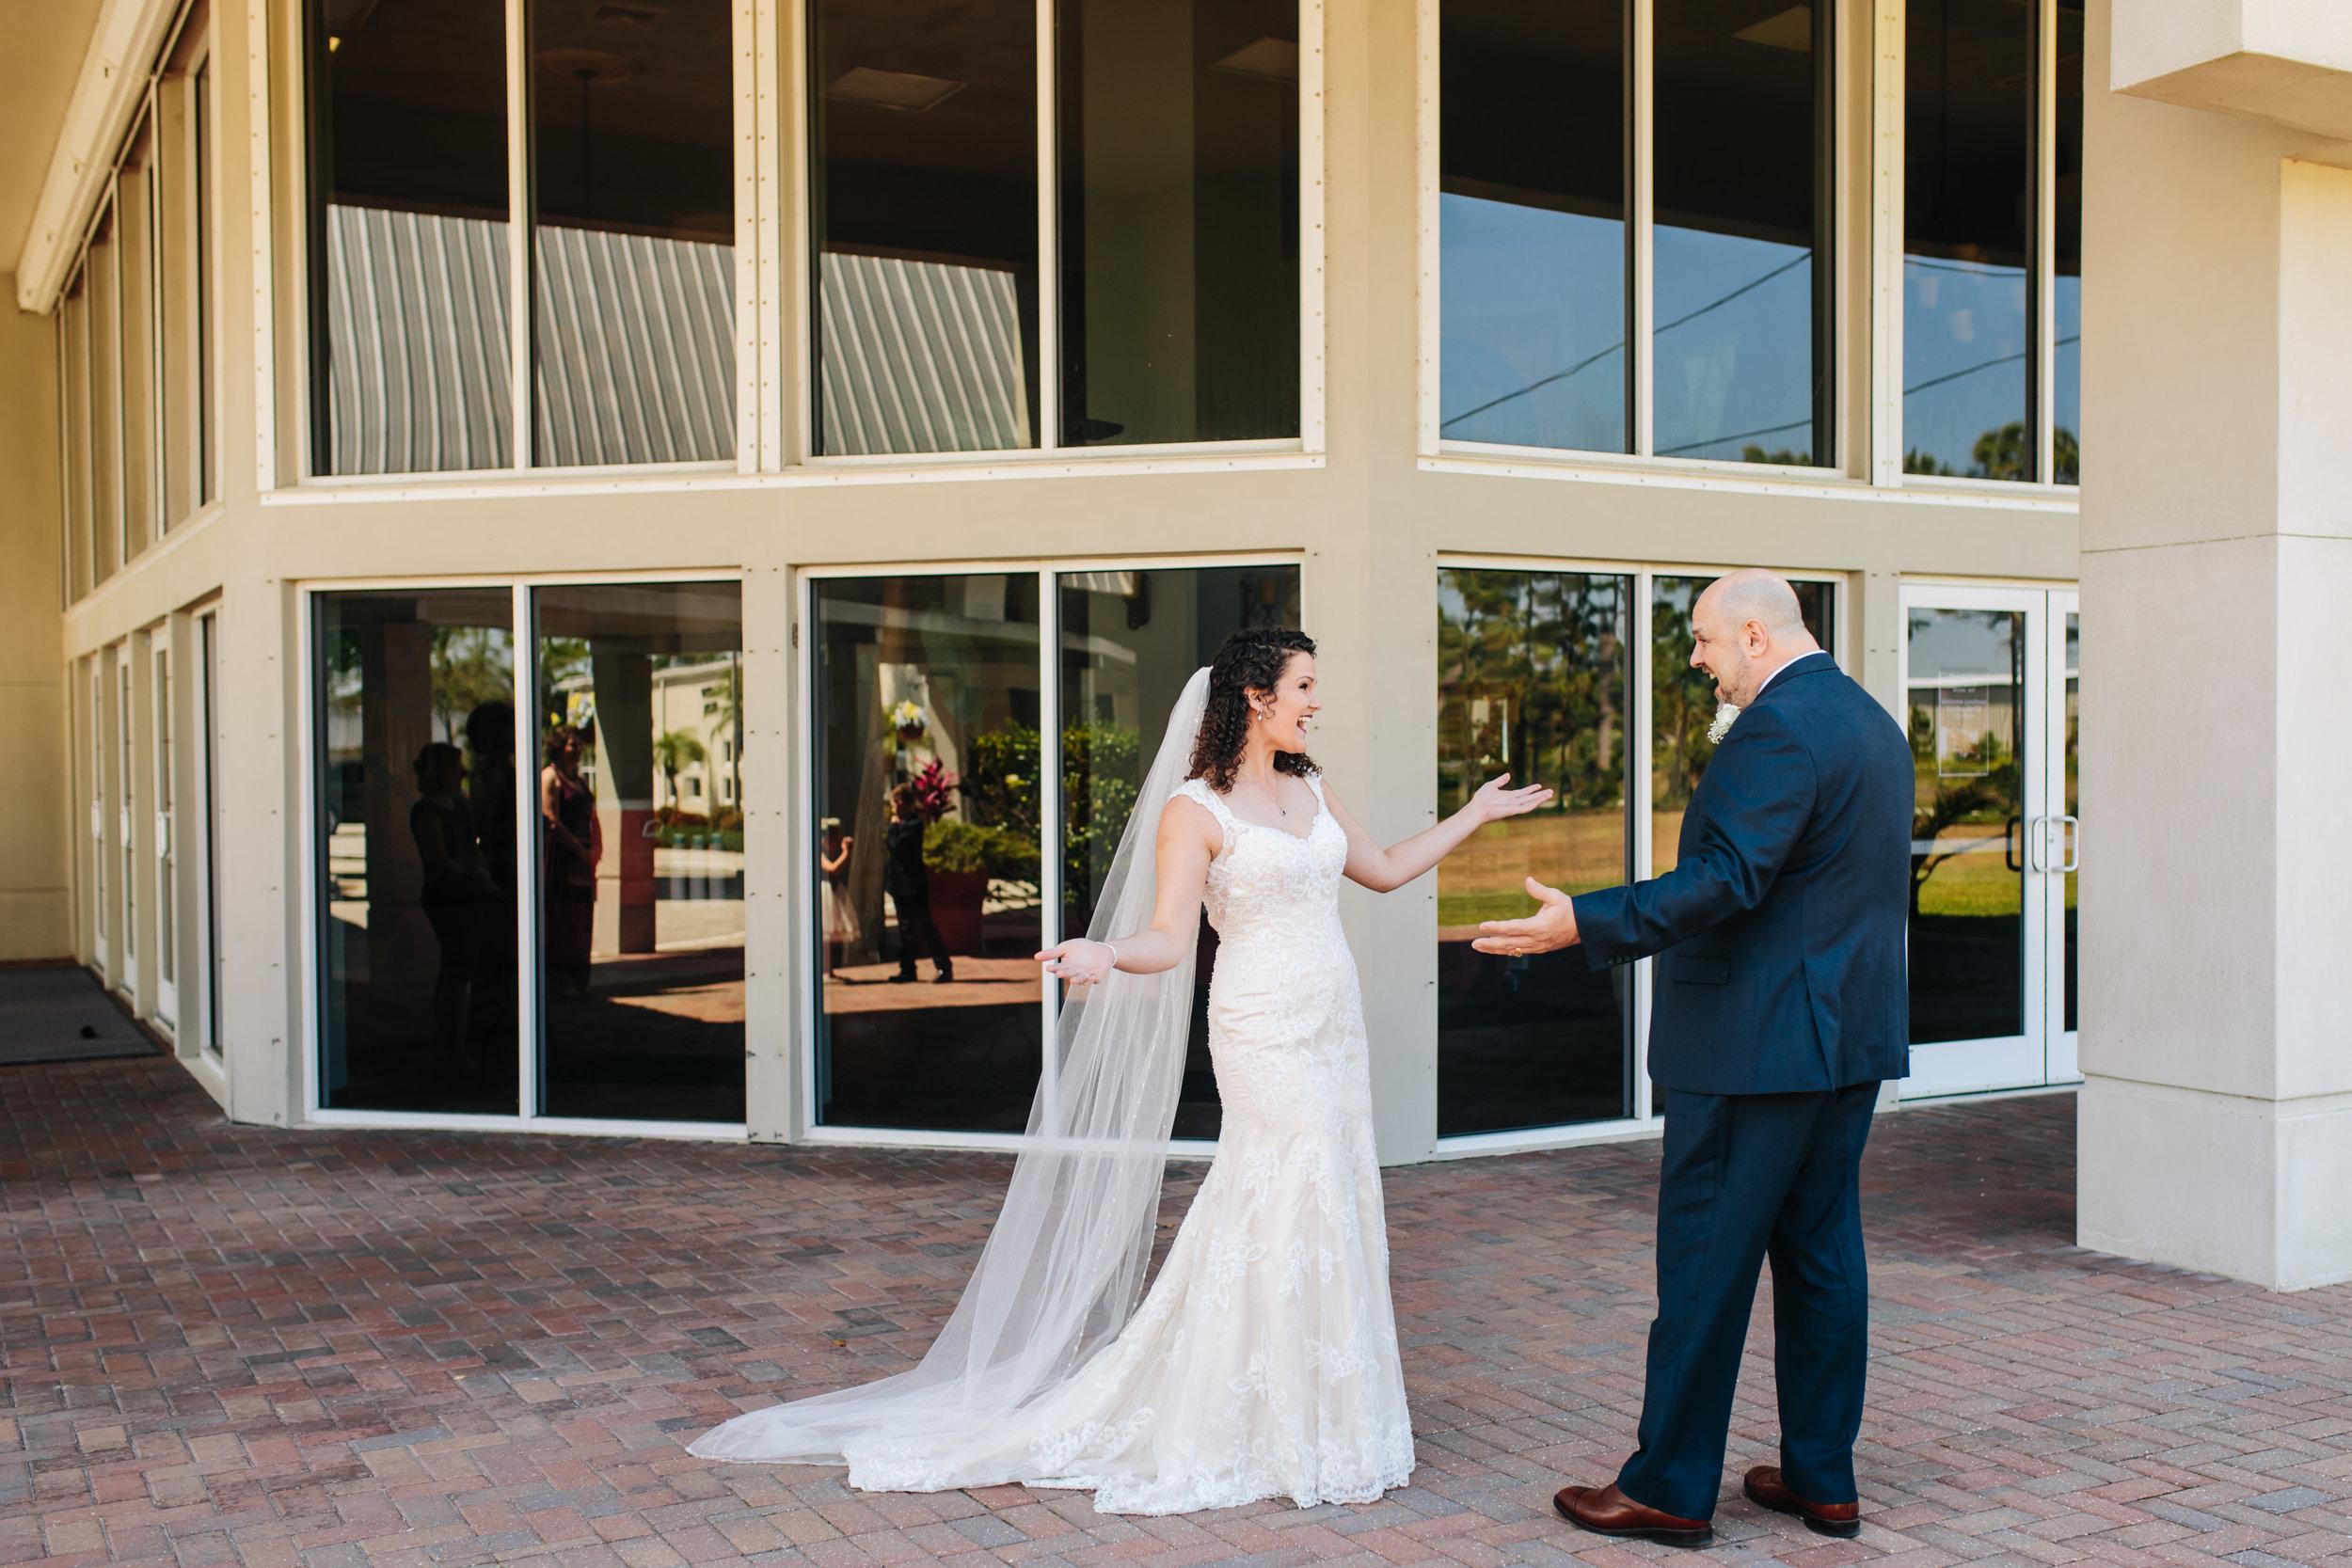 2018.03.17 Allison and Chuck Wedding Waelti Melbourne (82 of 900).jpg